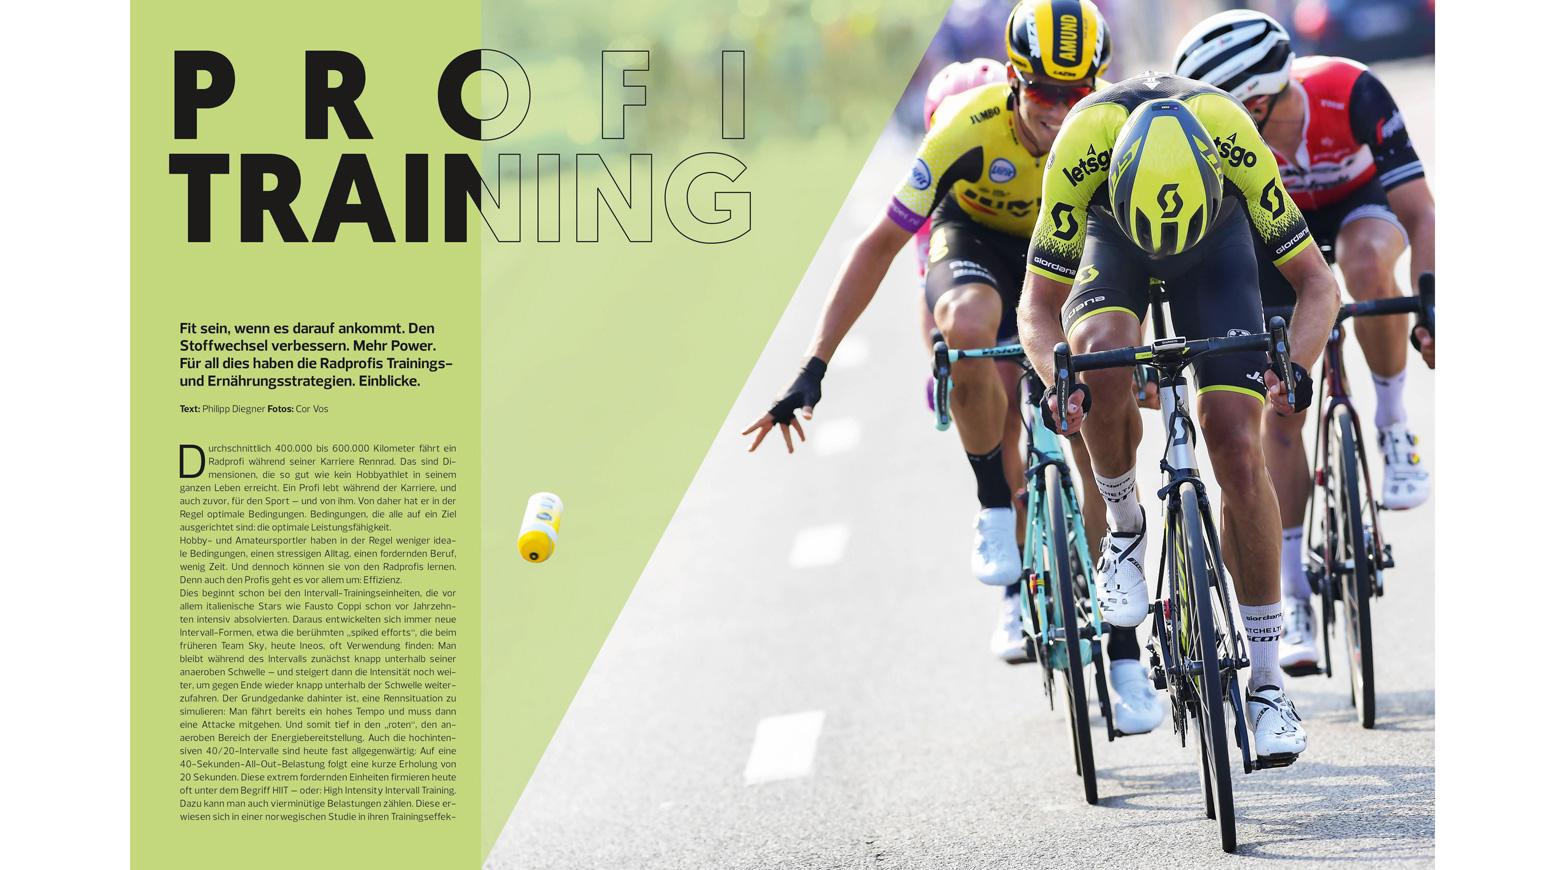 Training-Rennrad-Tipps